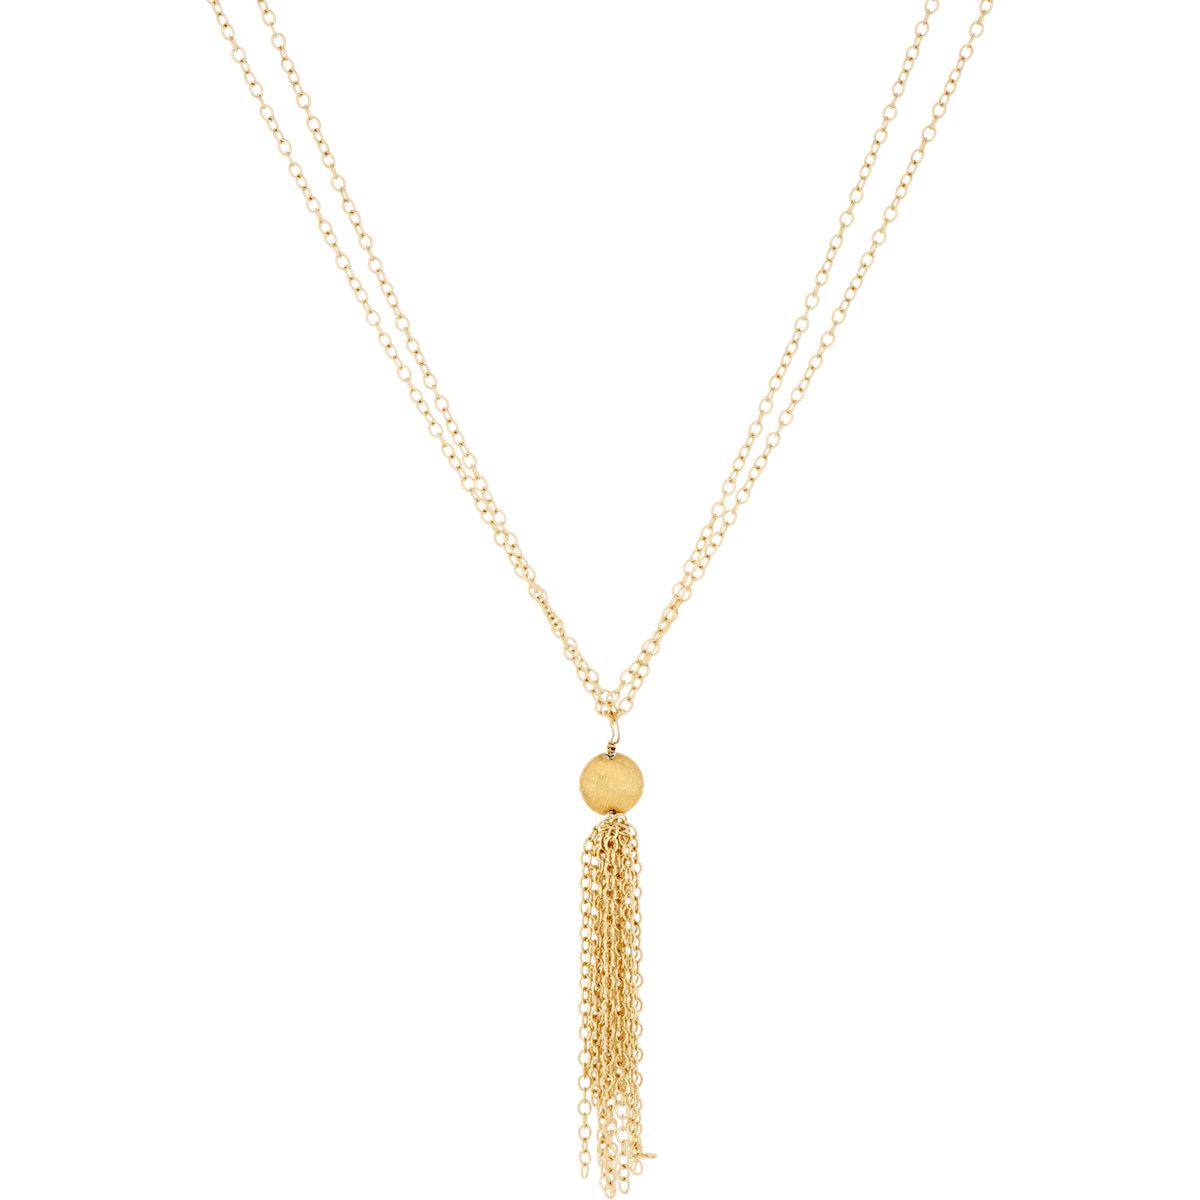 Sonia jewelry fashions arlington va Sonia Jewelry Fashions in Arlington, VA with Reviews - m